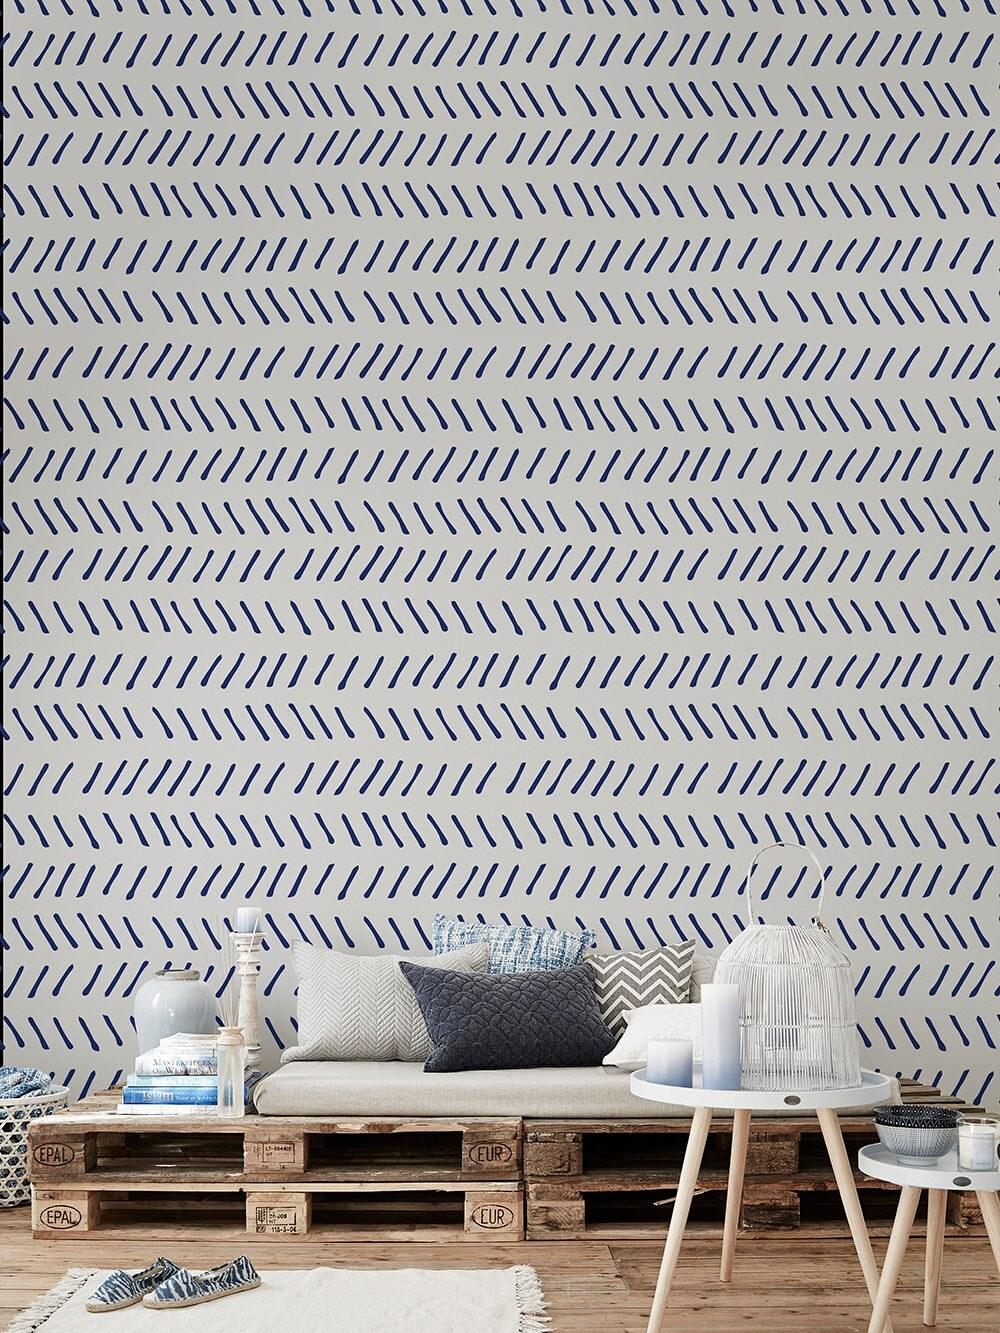 removable peel and stick self adhesive vinyl wallpaper. Black Bedroom Furniture Sets. Home Design Ideas